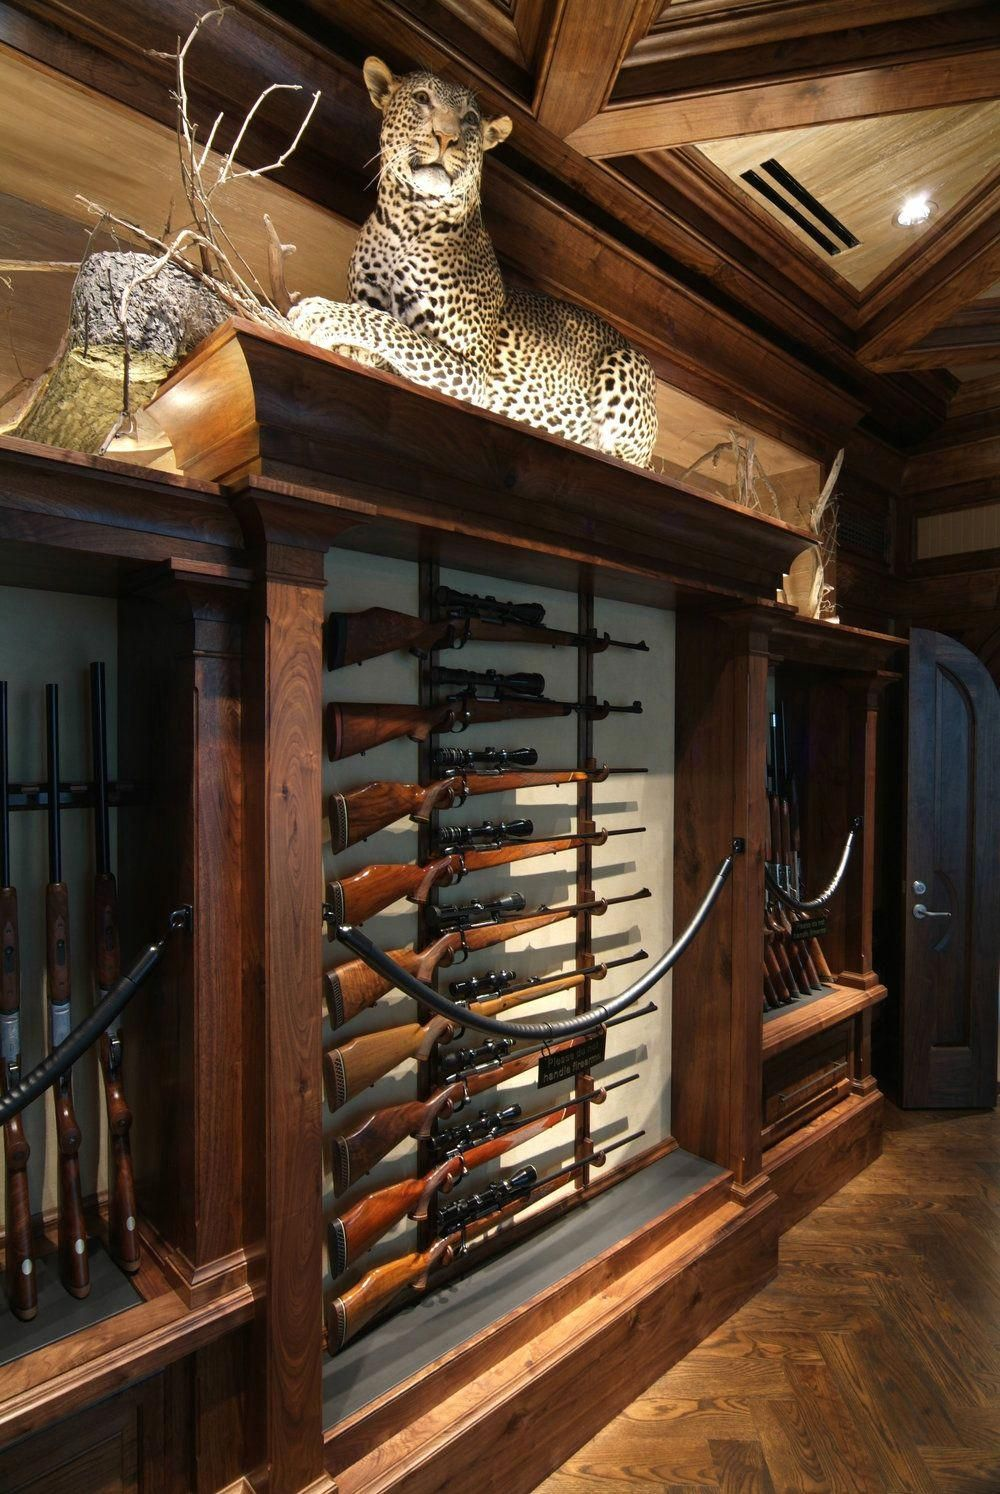 Safe Room Design: #guncabinet,gunstoragehidden,gunstoragediy,gunroom